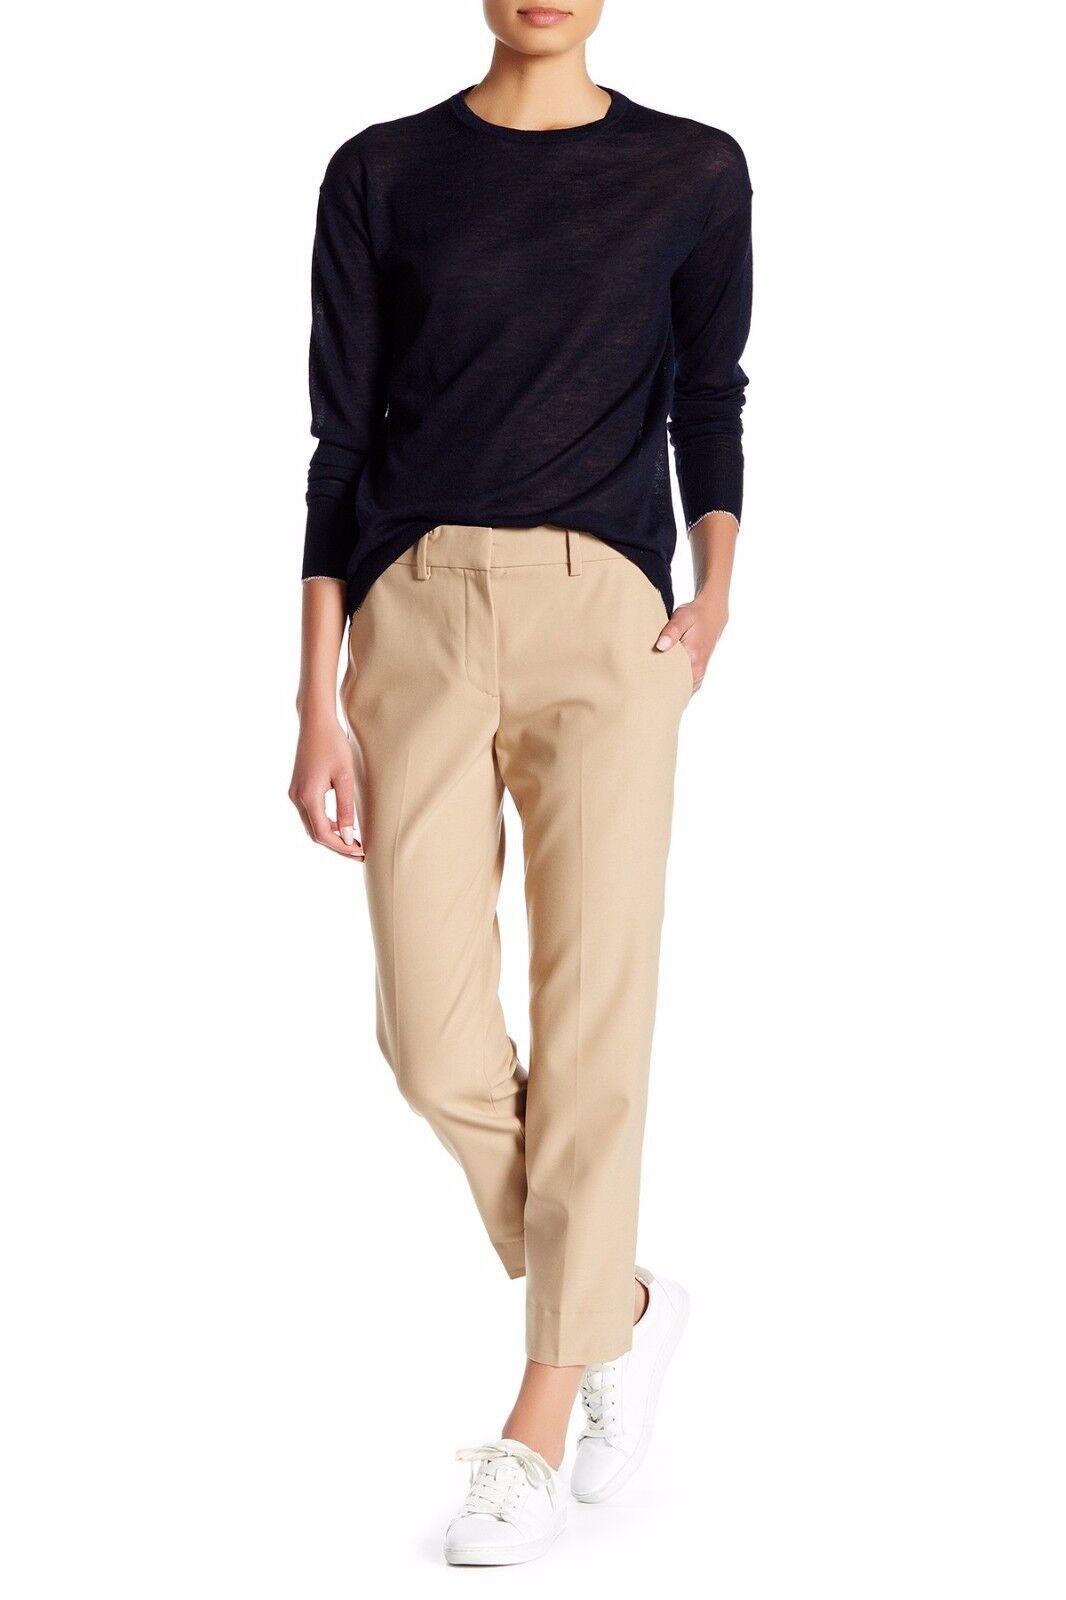 NWT Helmut Lang Raw Hem Cropped Trousers Pants Wool Blend Khaki  – 4, 6, 10